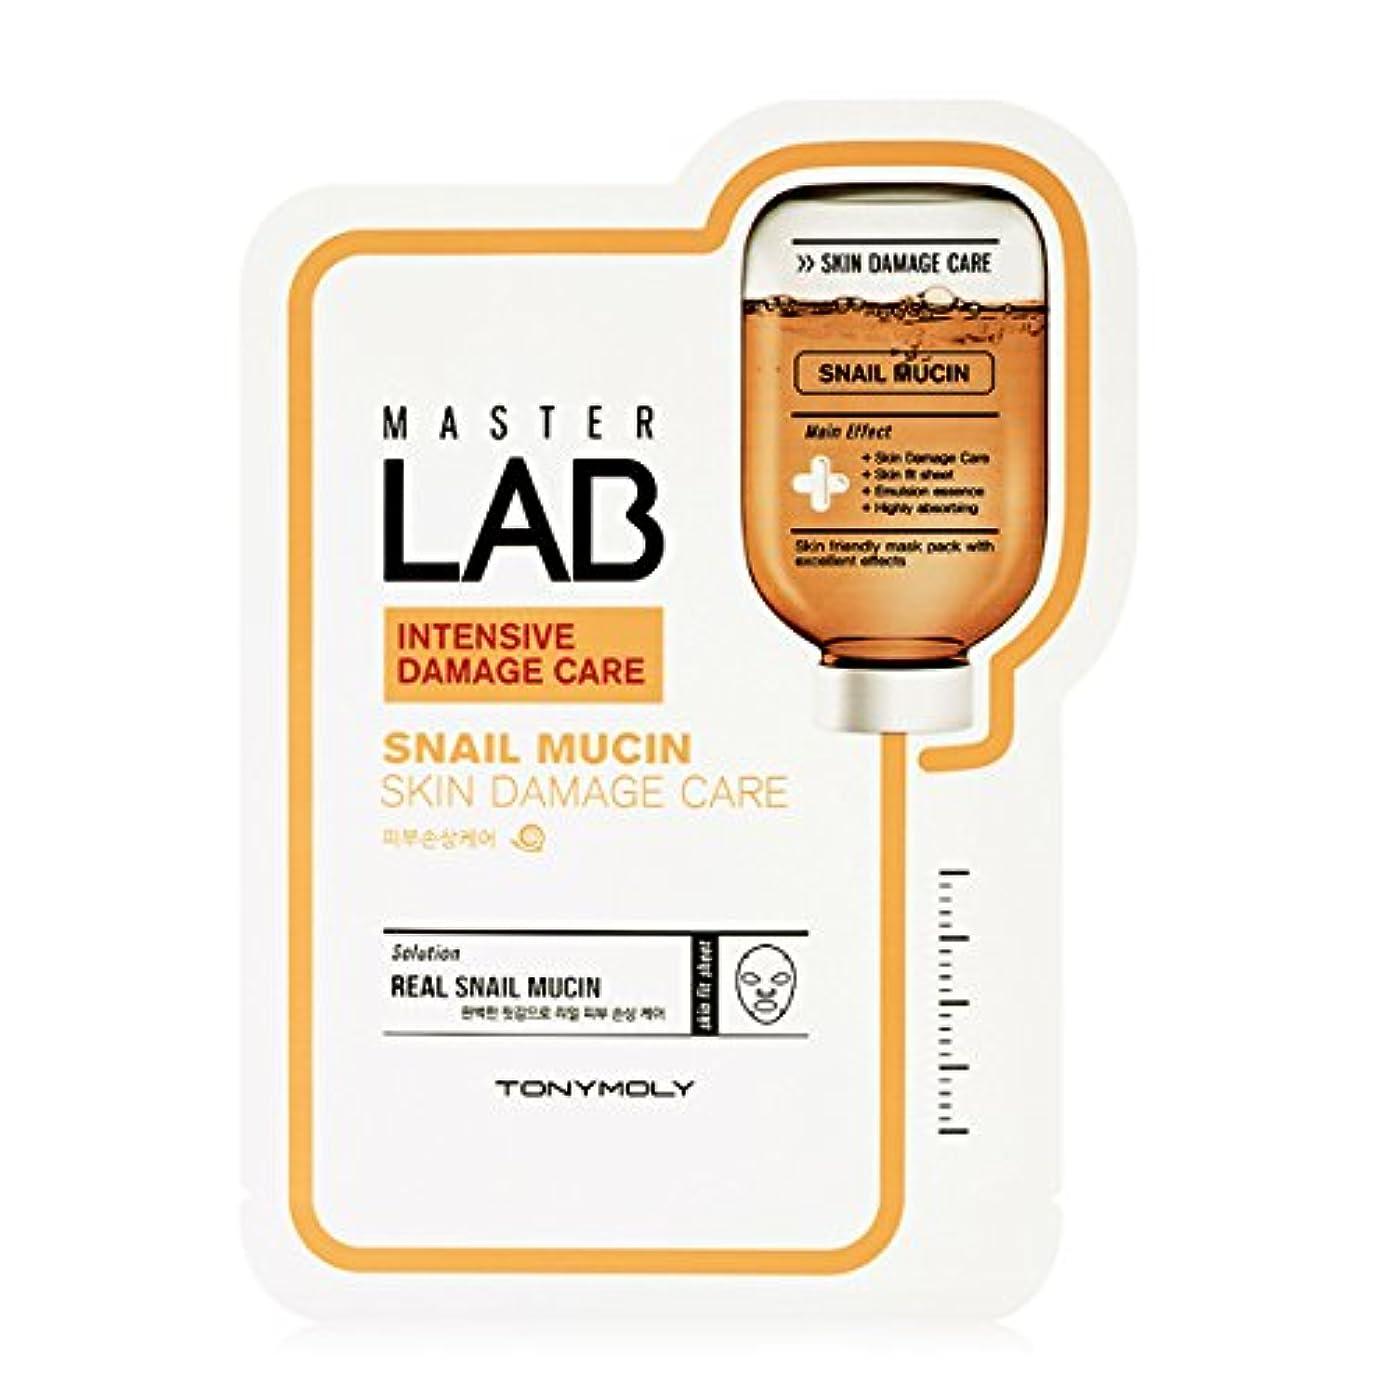 [New] TONYMOLY Master LAB Mask Sheet 19g×5ea/トニーモリー マスター ラブ マスクシート 19g×5枚 (#Snail Mucin:Skin Damage Care)